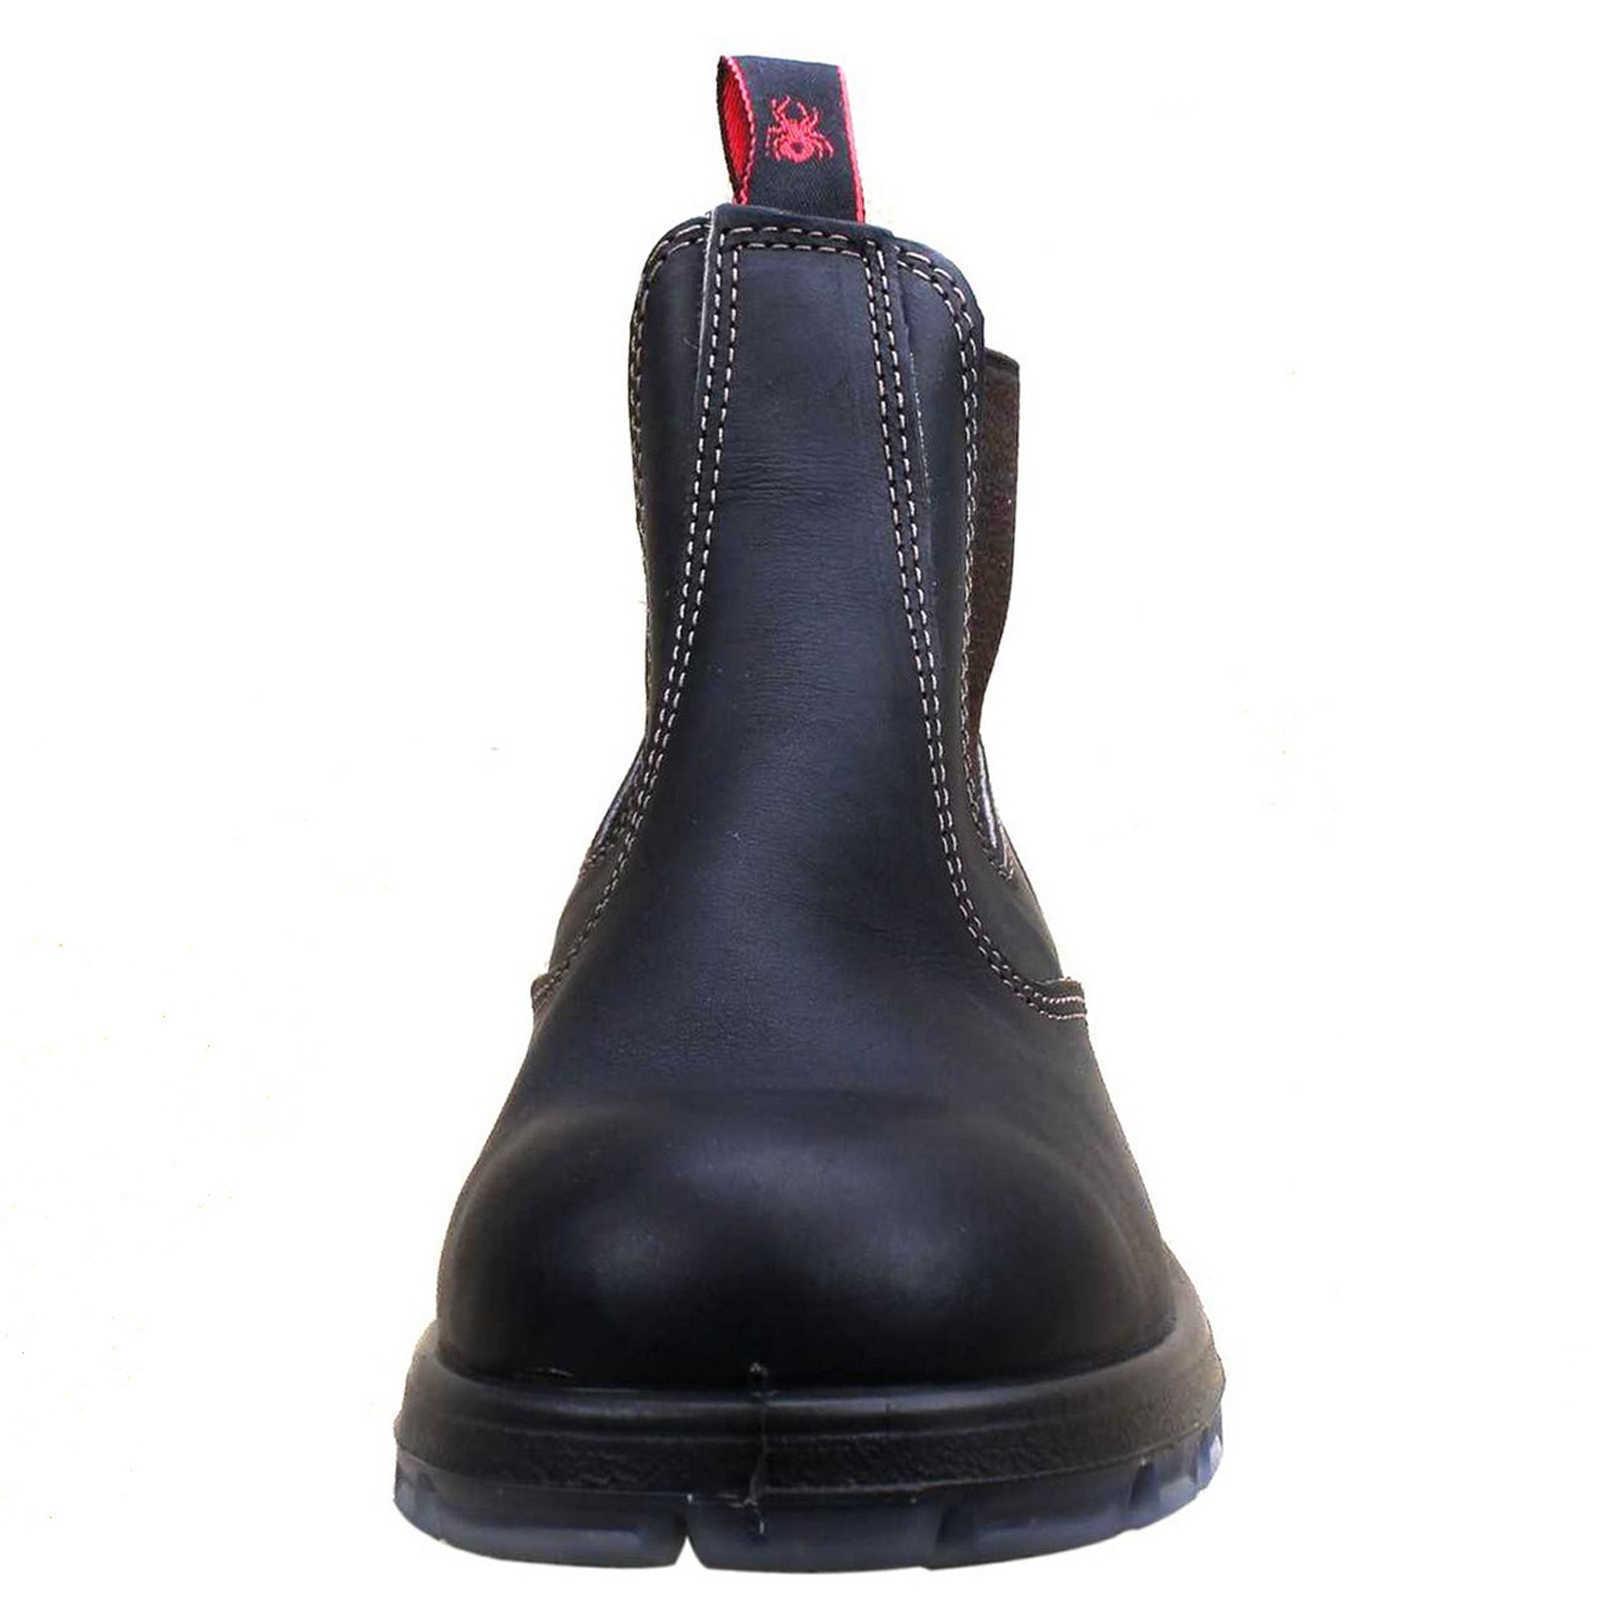 24c6298a74c Details about New REDBACK UBOK Bobcat Soft Toe Boot - DARK BROWN (AUS / US  / EU Mens Sizing)